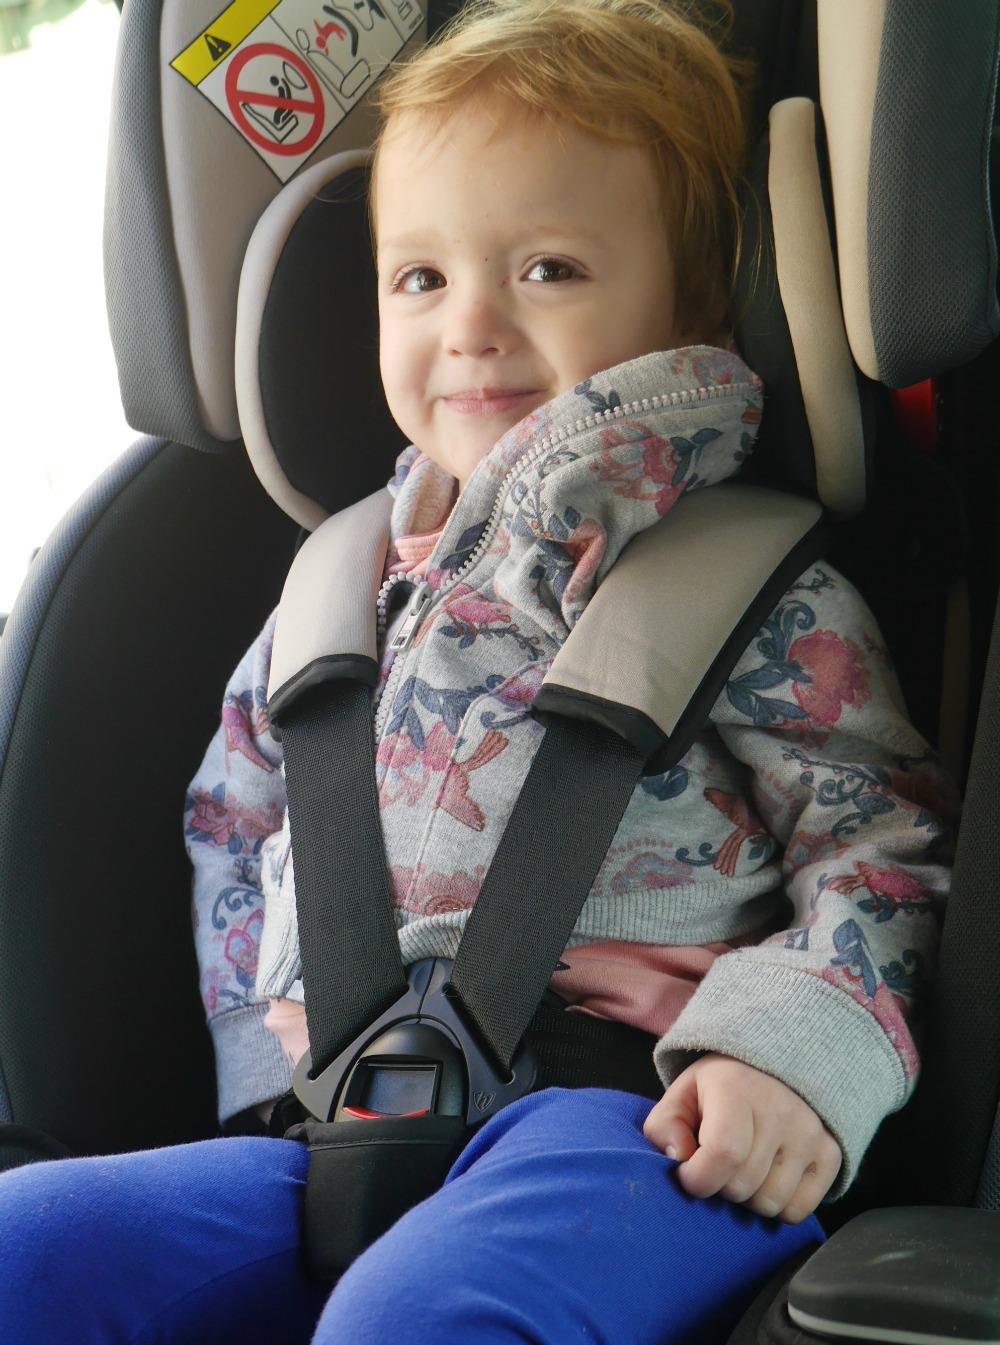 Graco Milestone Review 3 In 1 Convertible Car Seat